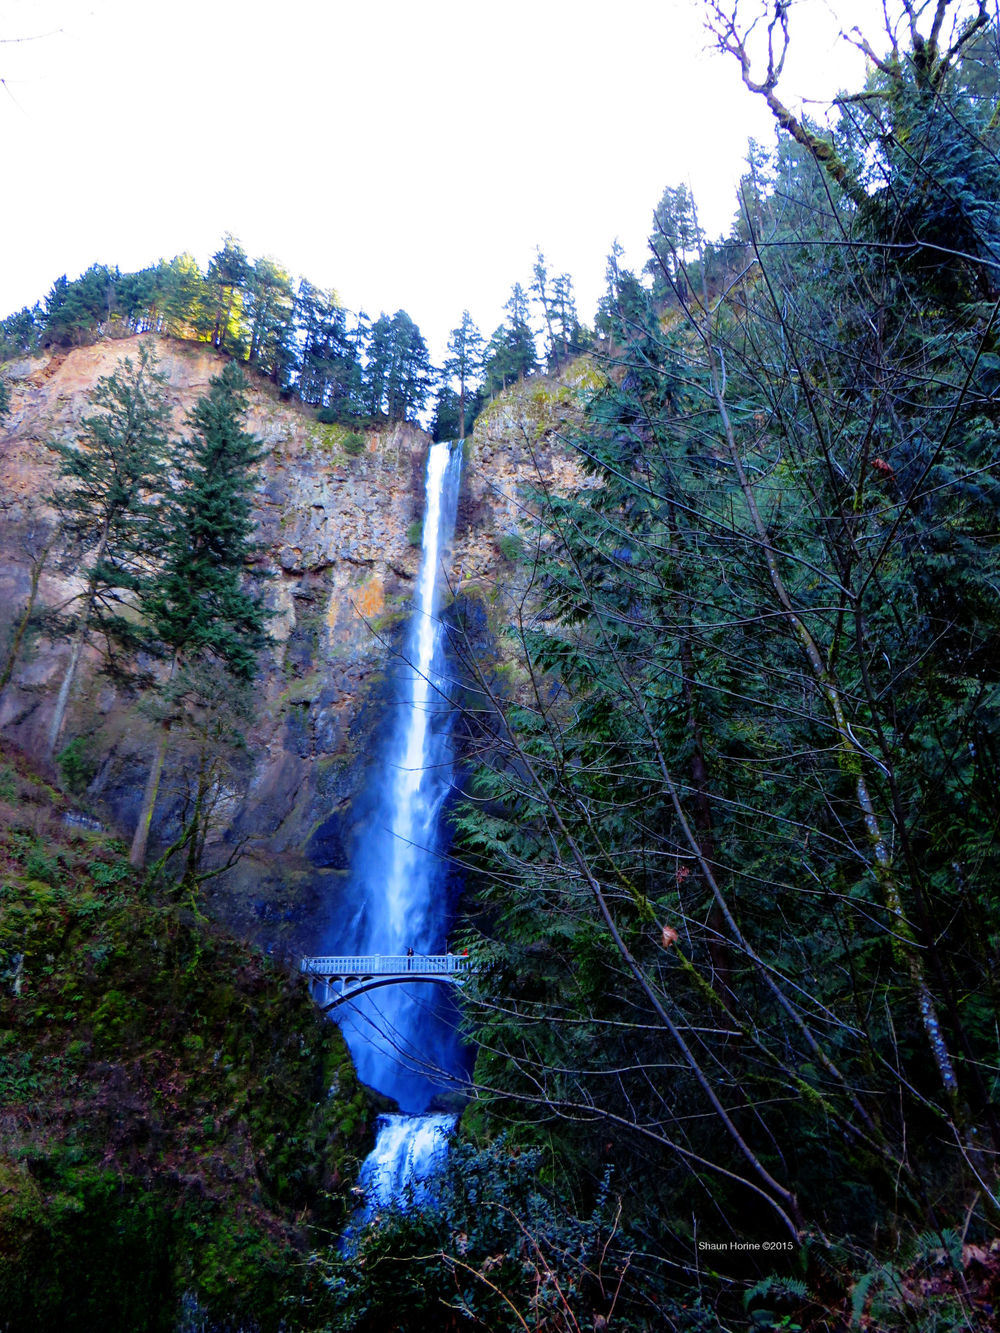 Multnomah Falls heading up to the bridge. March 1st, 2015